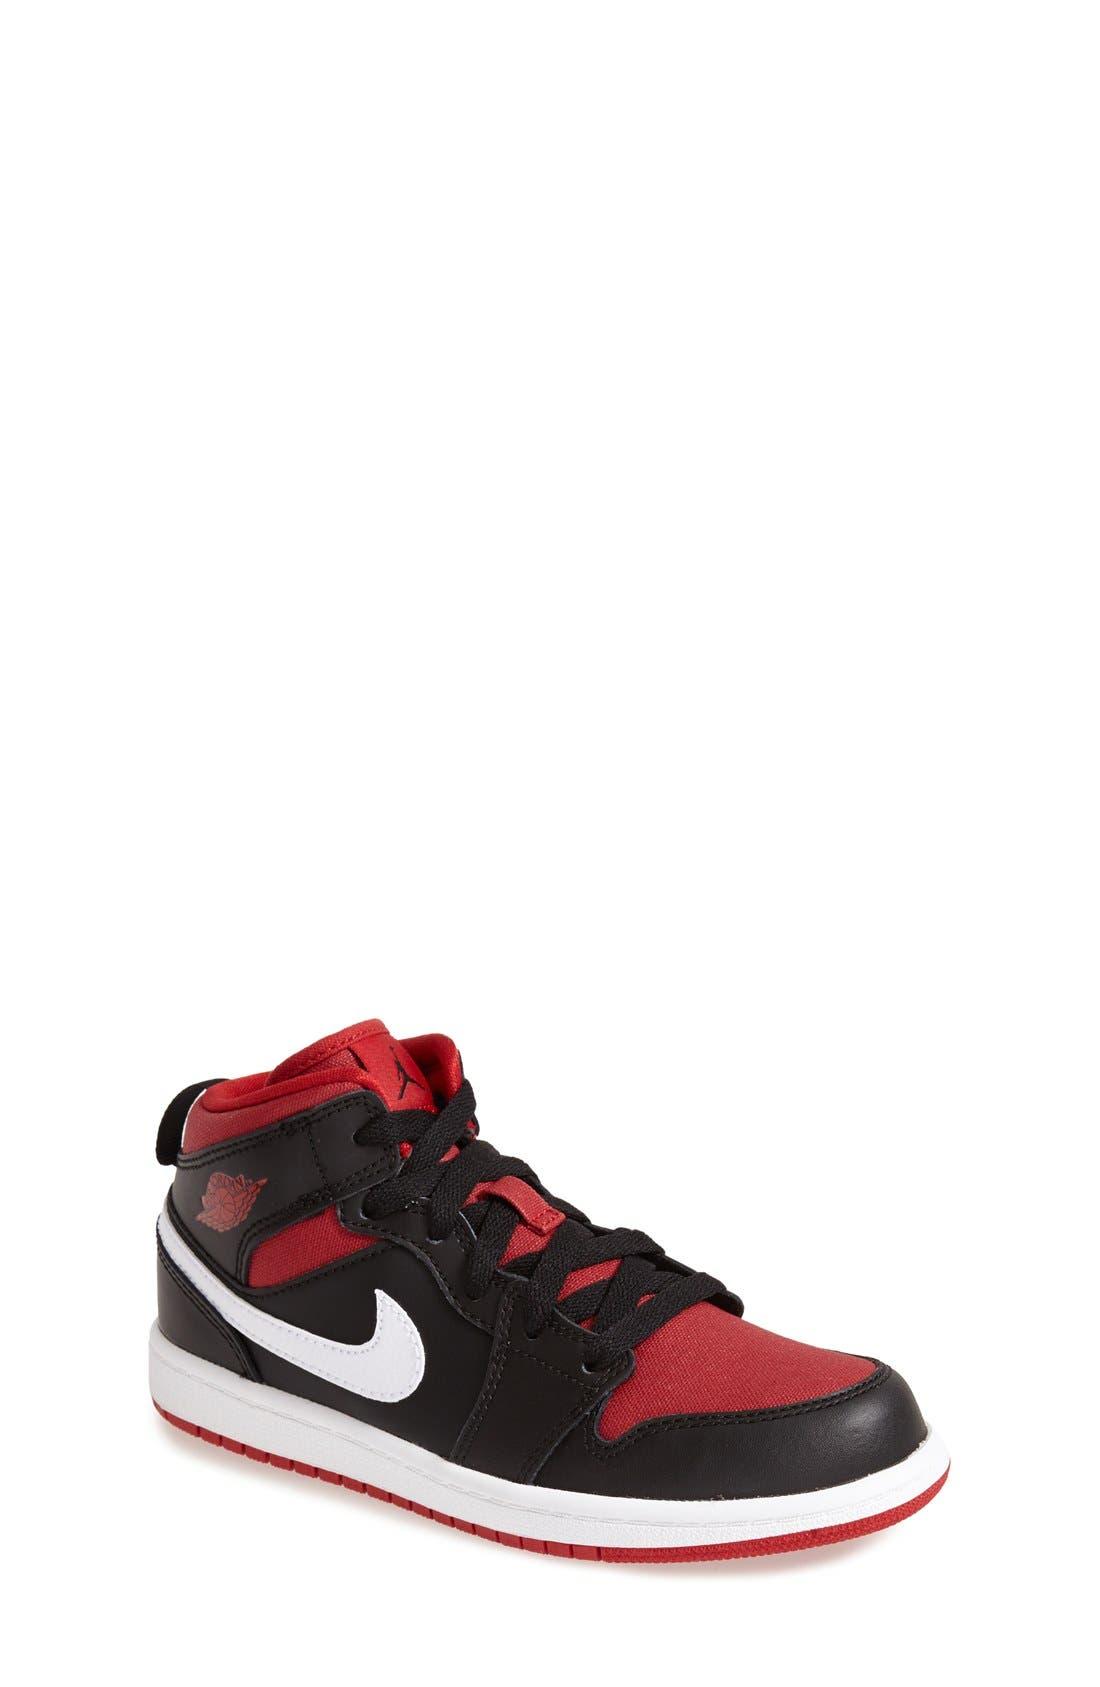 'Air Jordan 1' Mid Sneaker,                             Main thumbnail 1, color,                             003